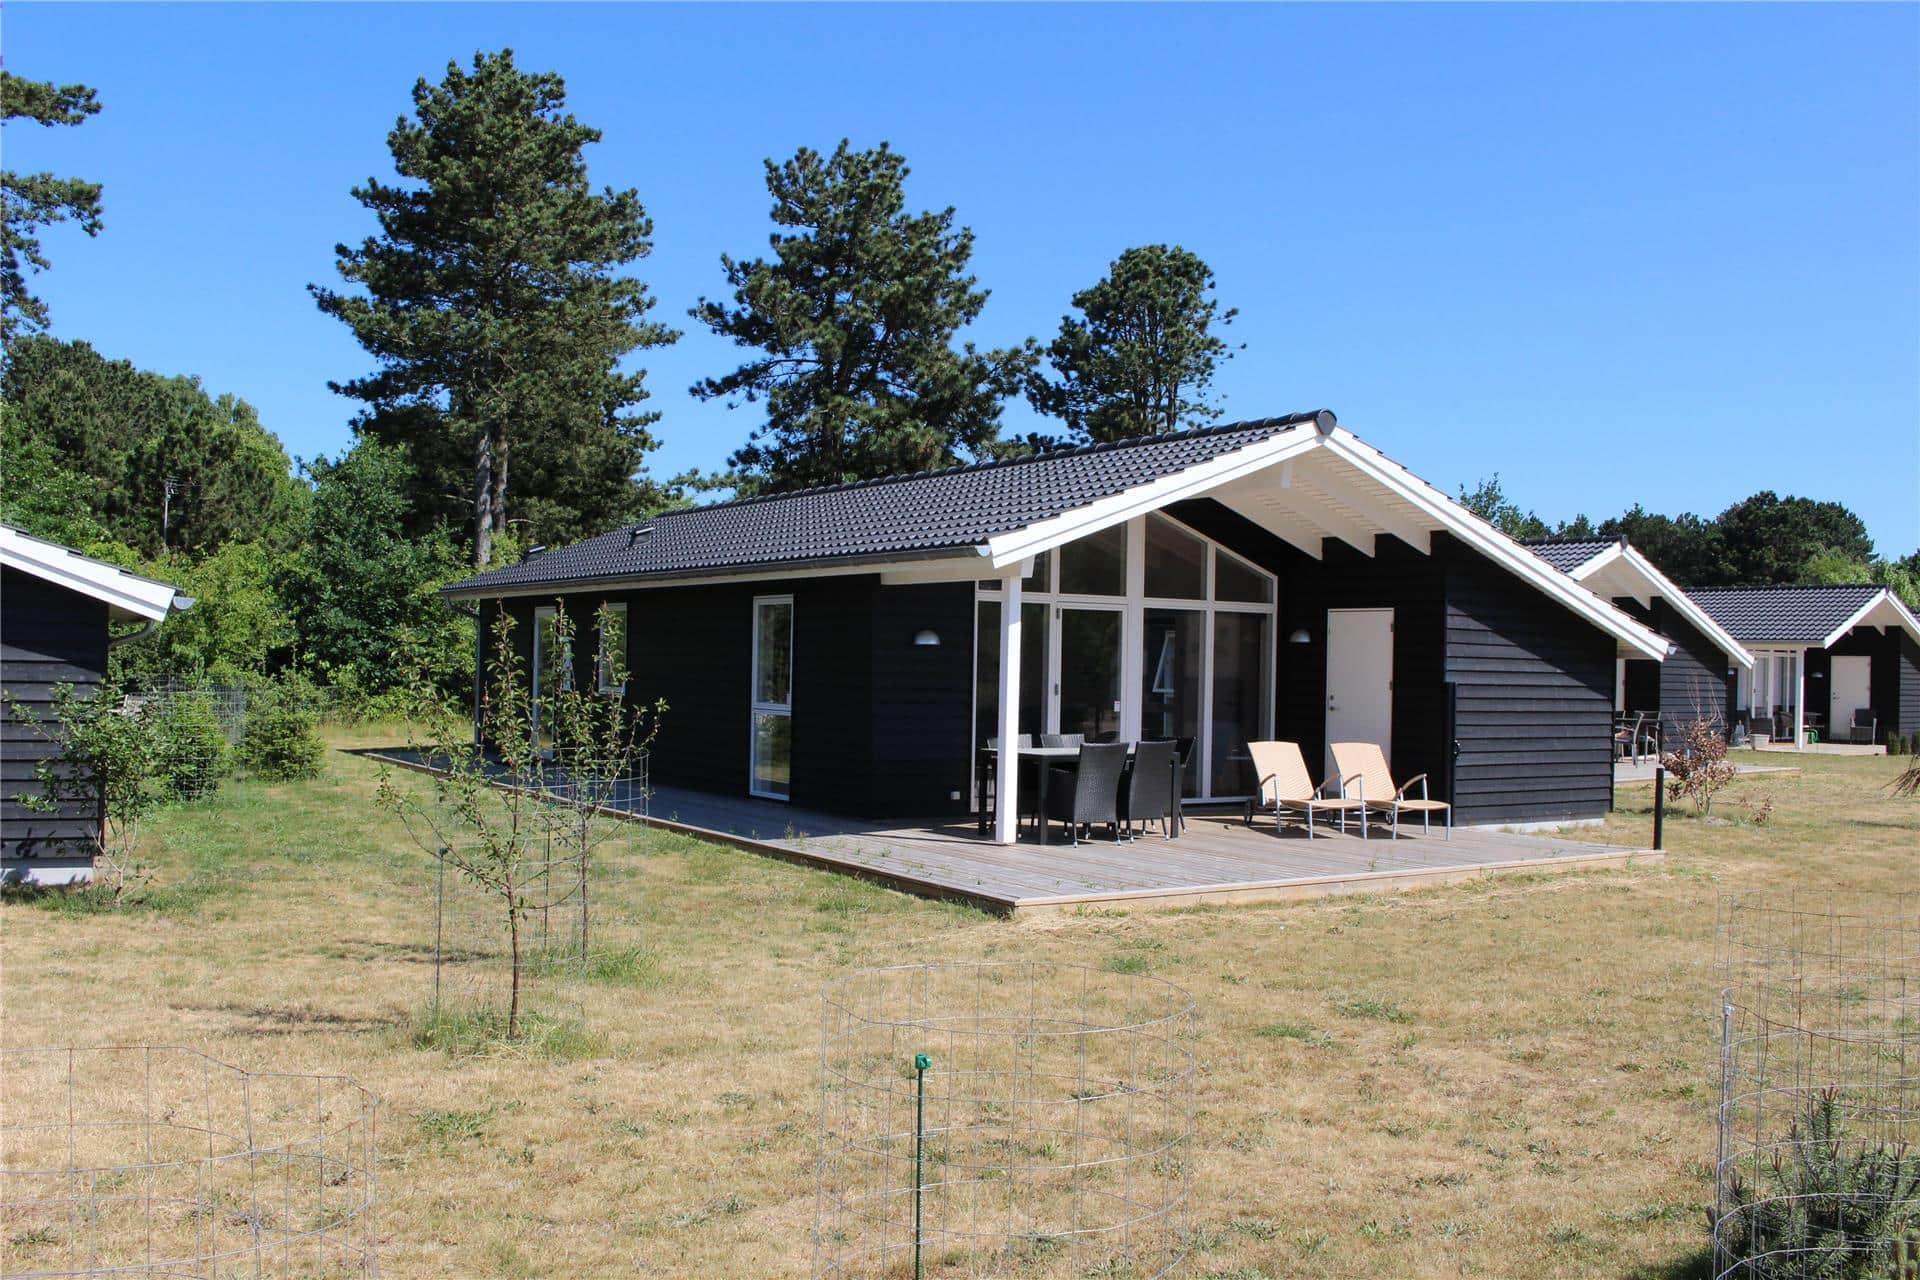 Bild 1-17 Ferienhaus 11190, Lynghækken 10, DK - 4500 Nykøbing Sj